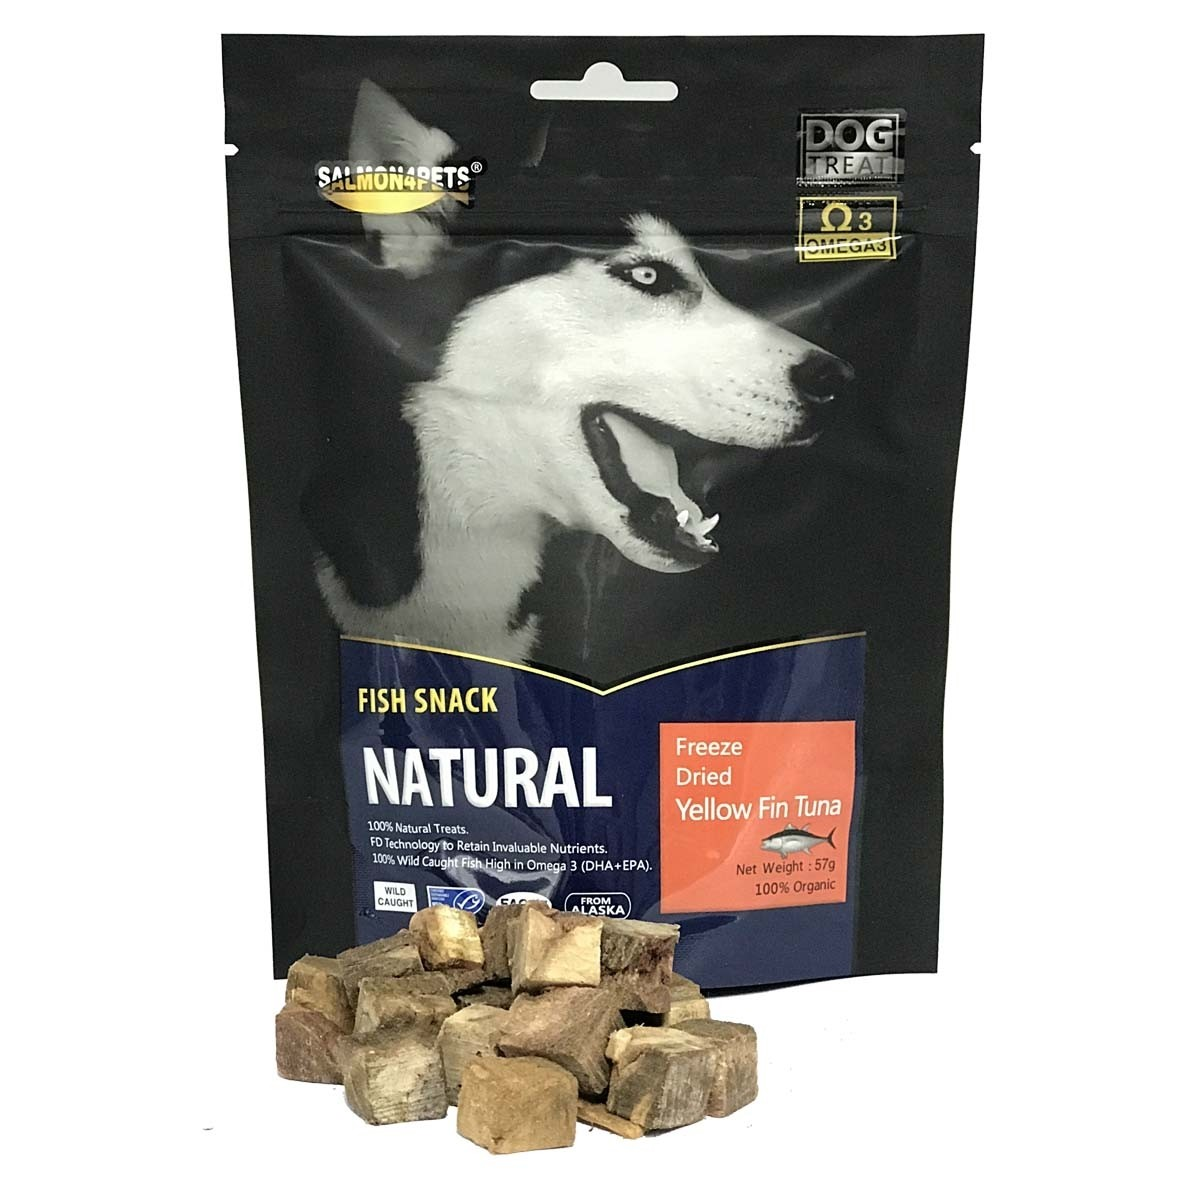 Salmon4Pets Dog Treats Freeze Dried Yellow Fin Tuna  - 57g (F52500)